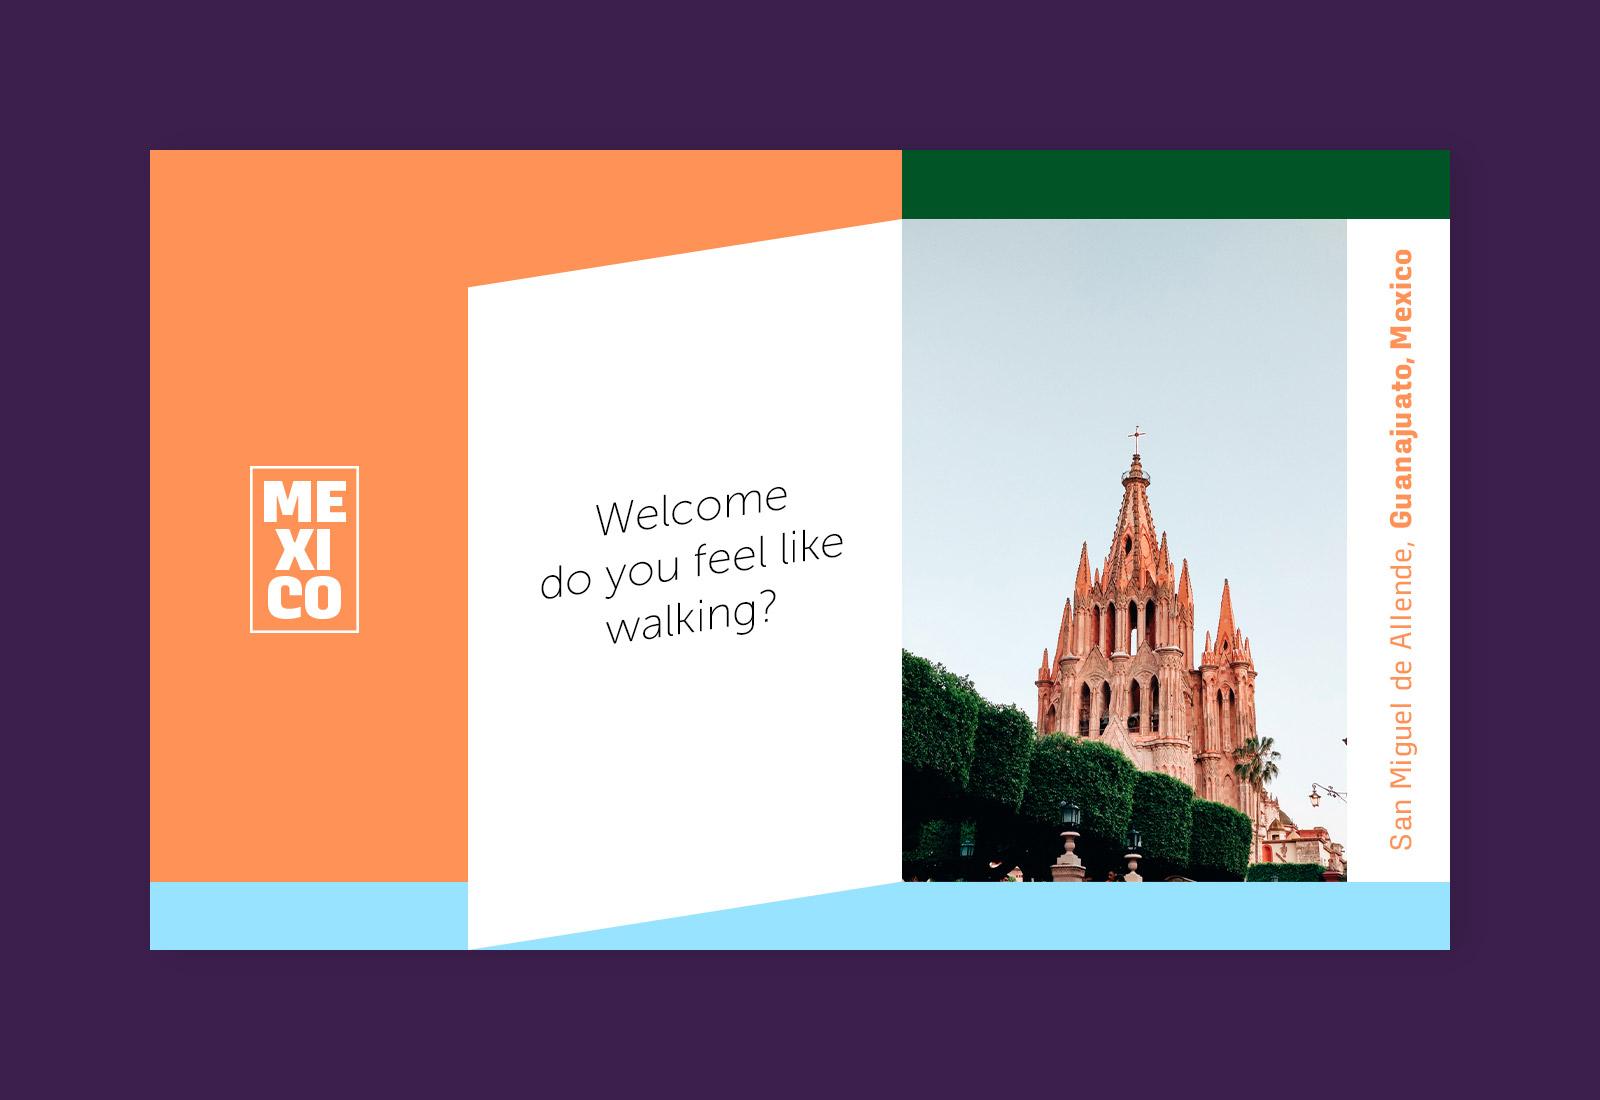 boom-agencia-marketing-digital-conexstur-website-posters